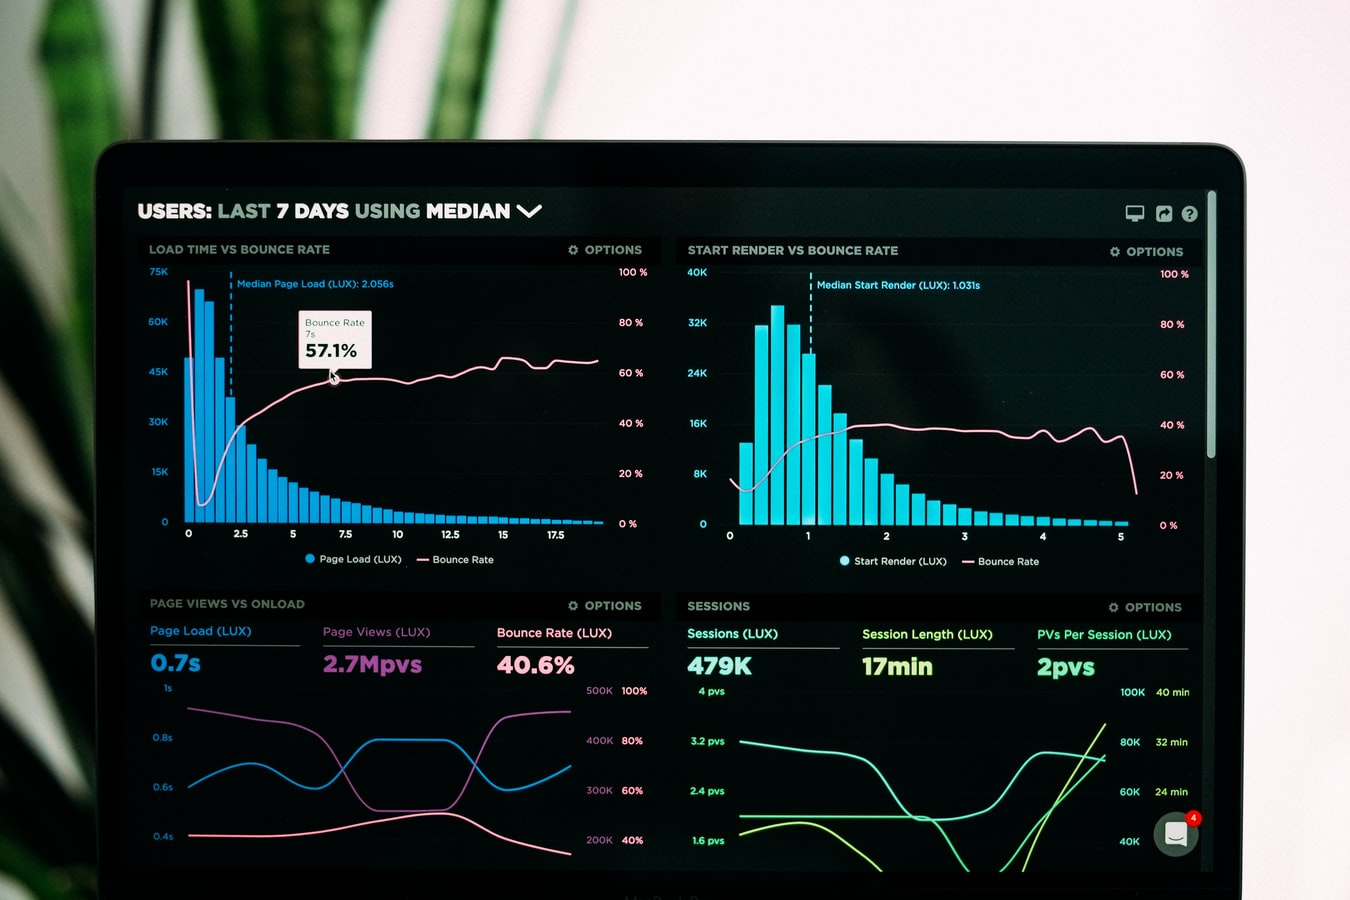 analytics last seven days using median